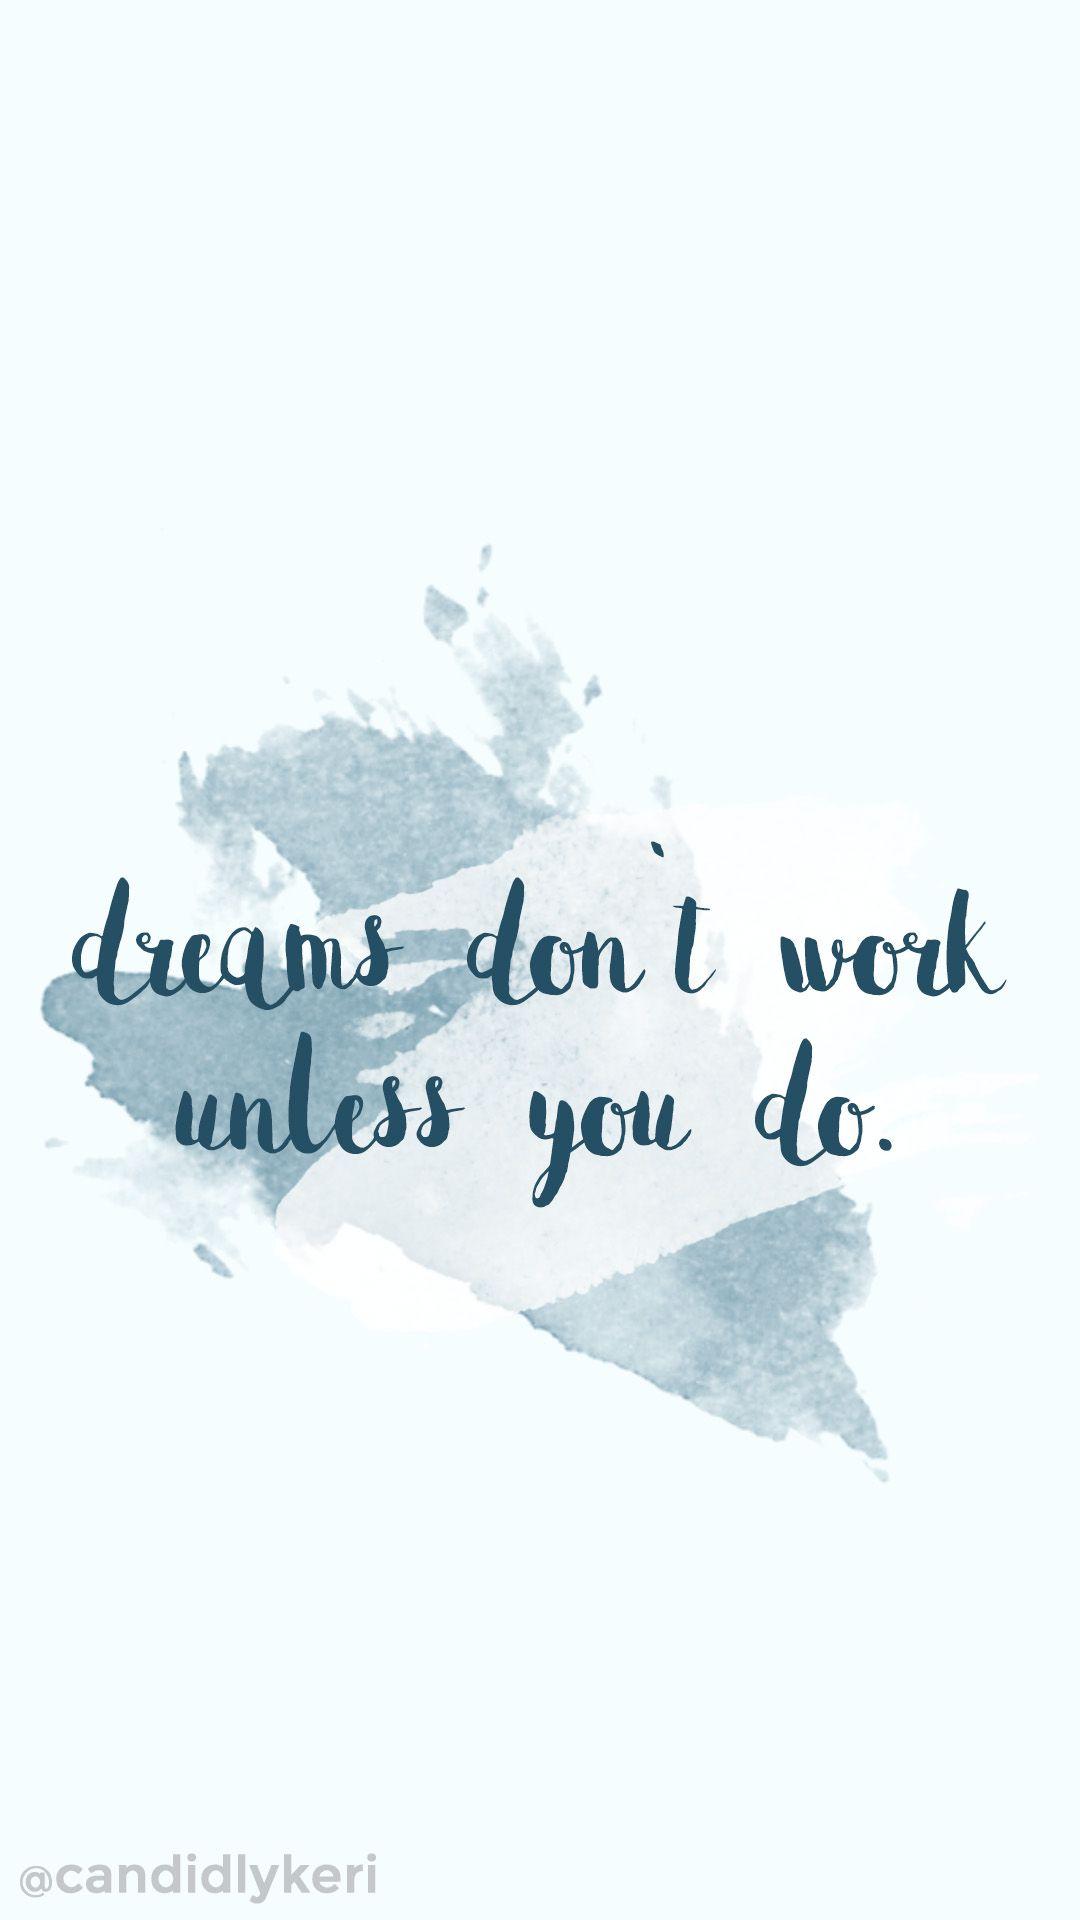 Hello Fall Wallpaper Macbook Pro Quot Dreams Dont Work Unless You Do Quot Blue Watercolor Splash